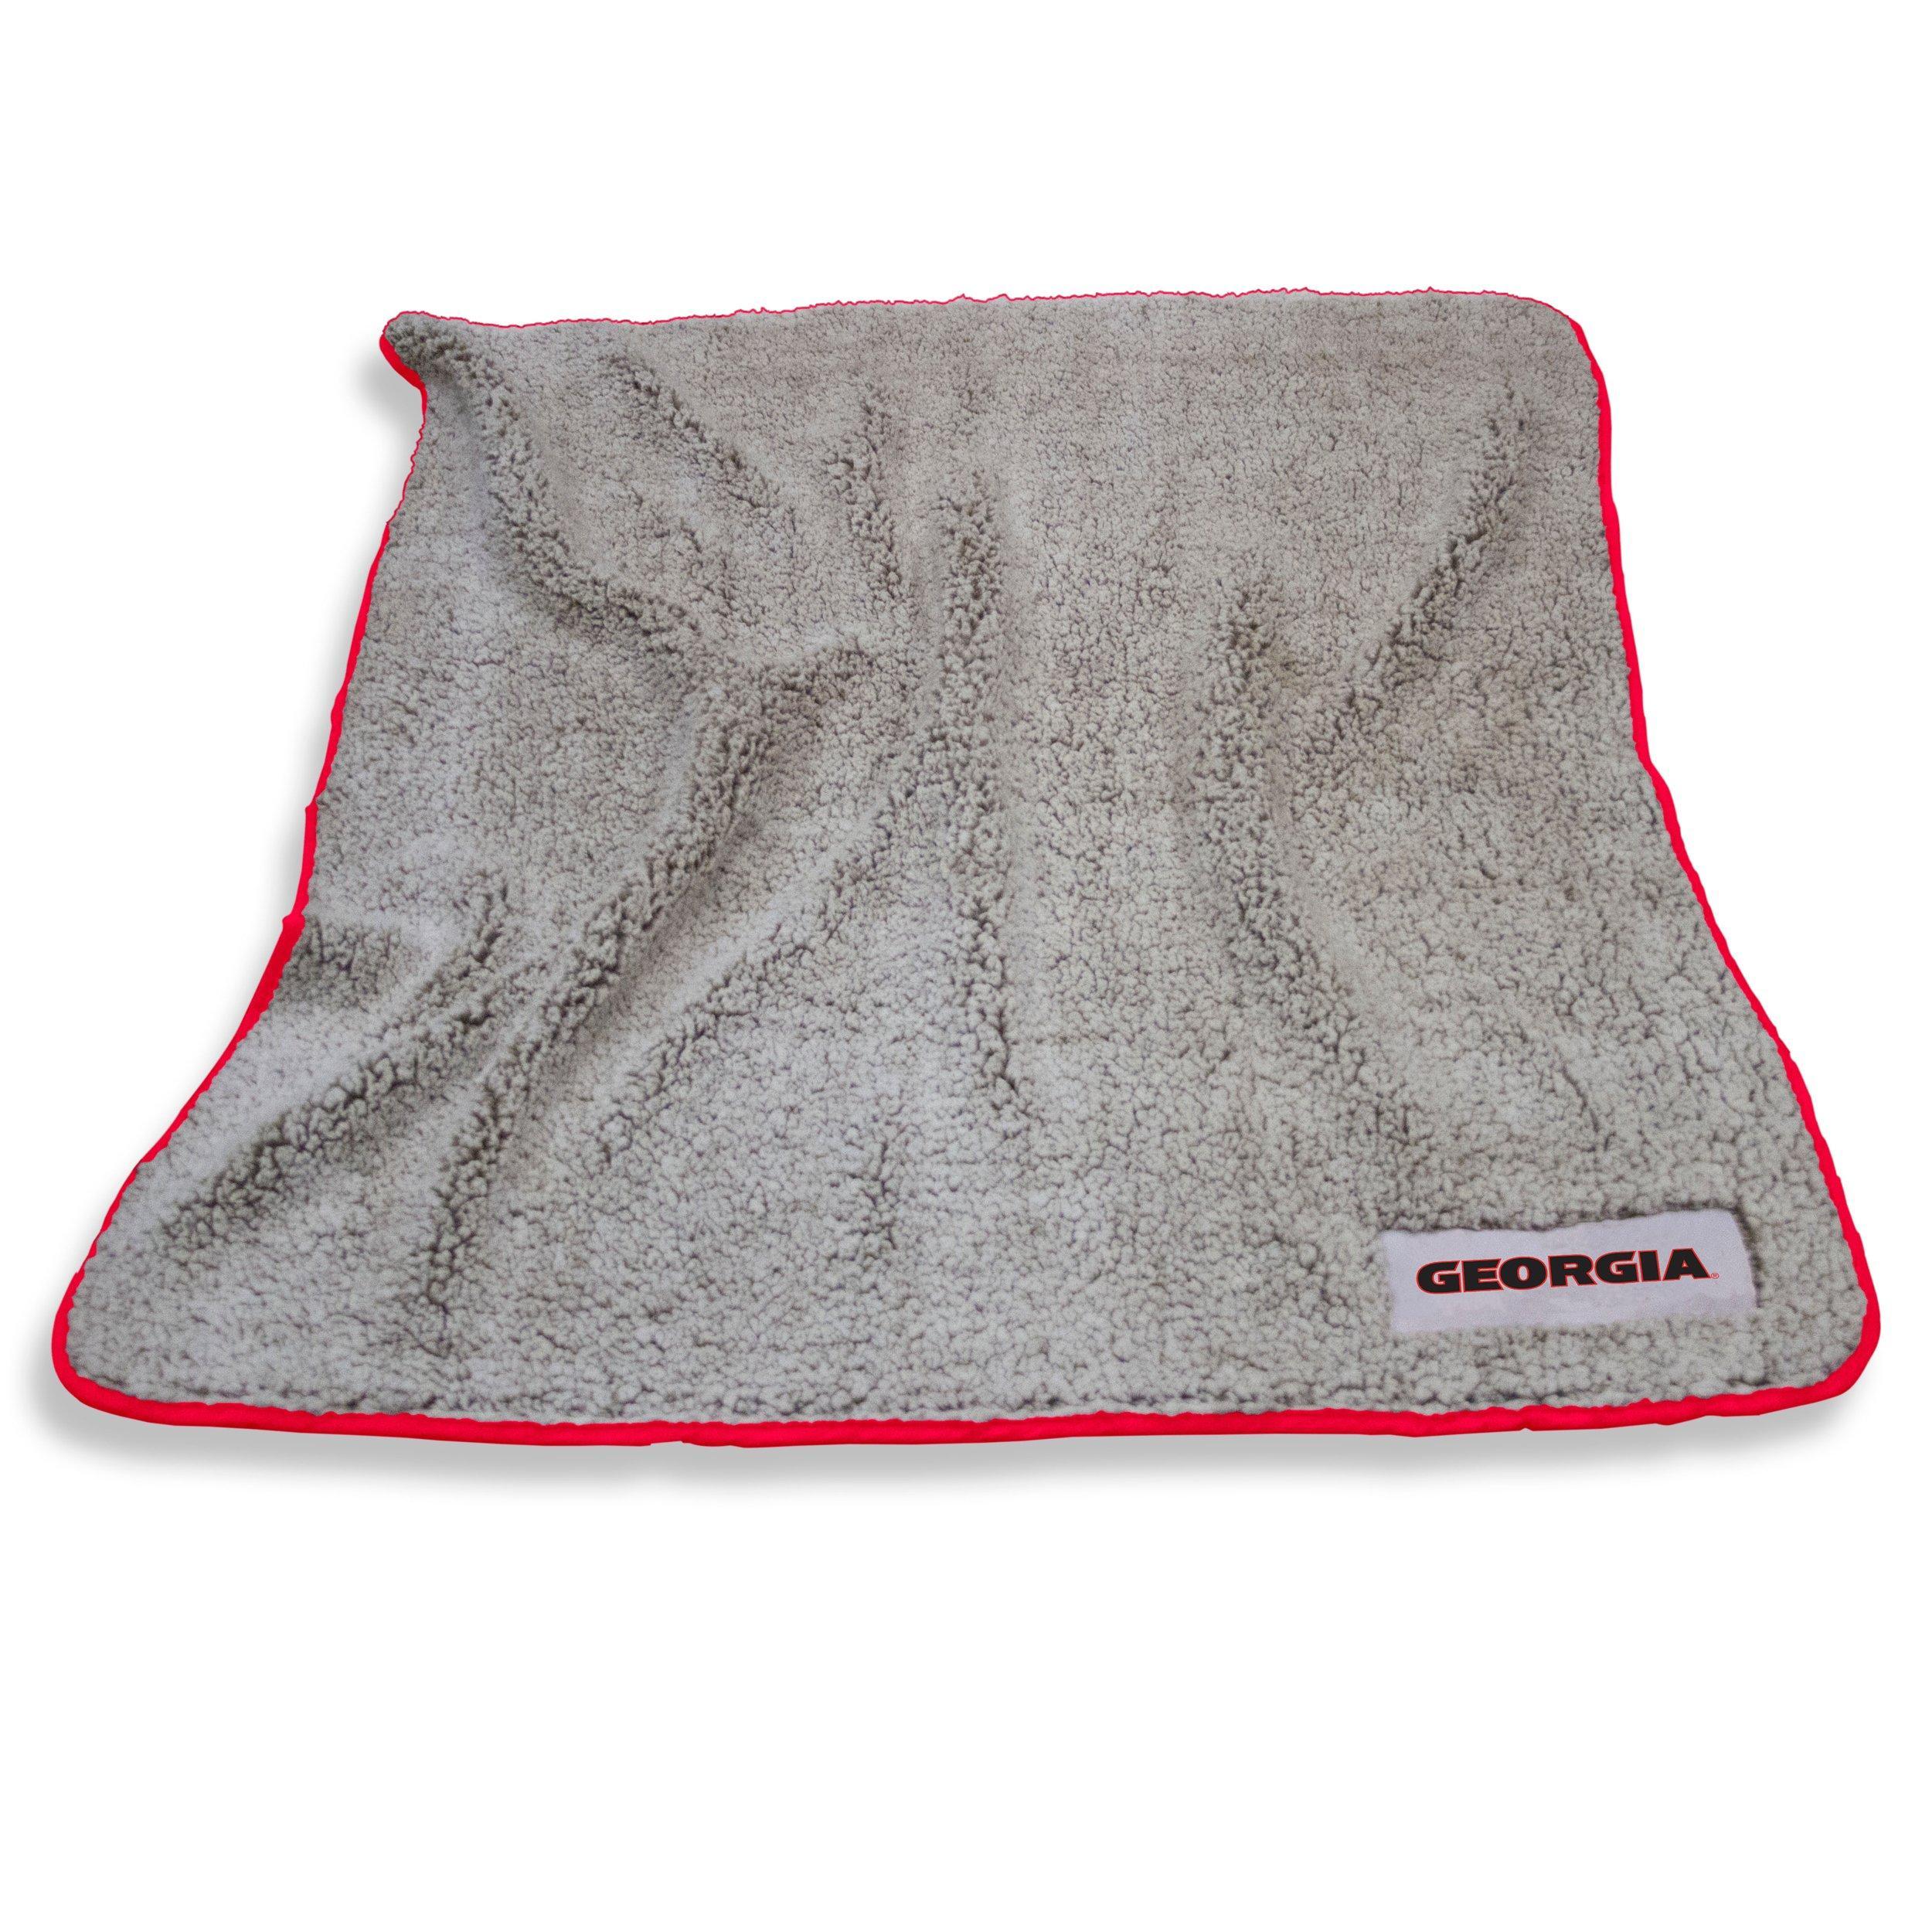 georgia chair company comfy kids chairs logo bulldogs frosty fleece blanket hibbett us main container image 1